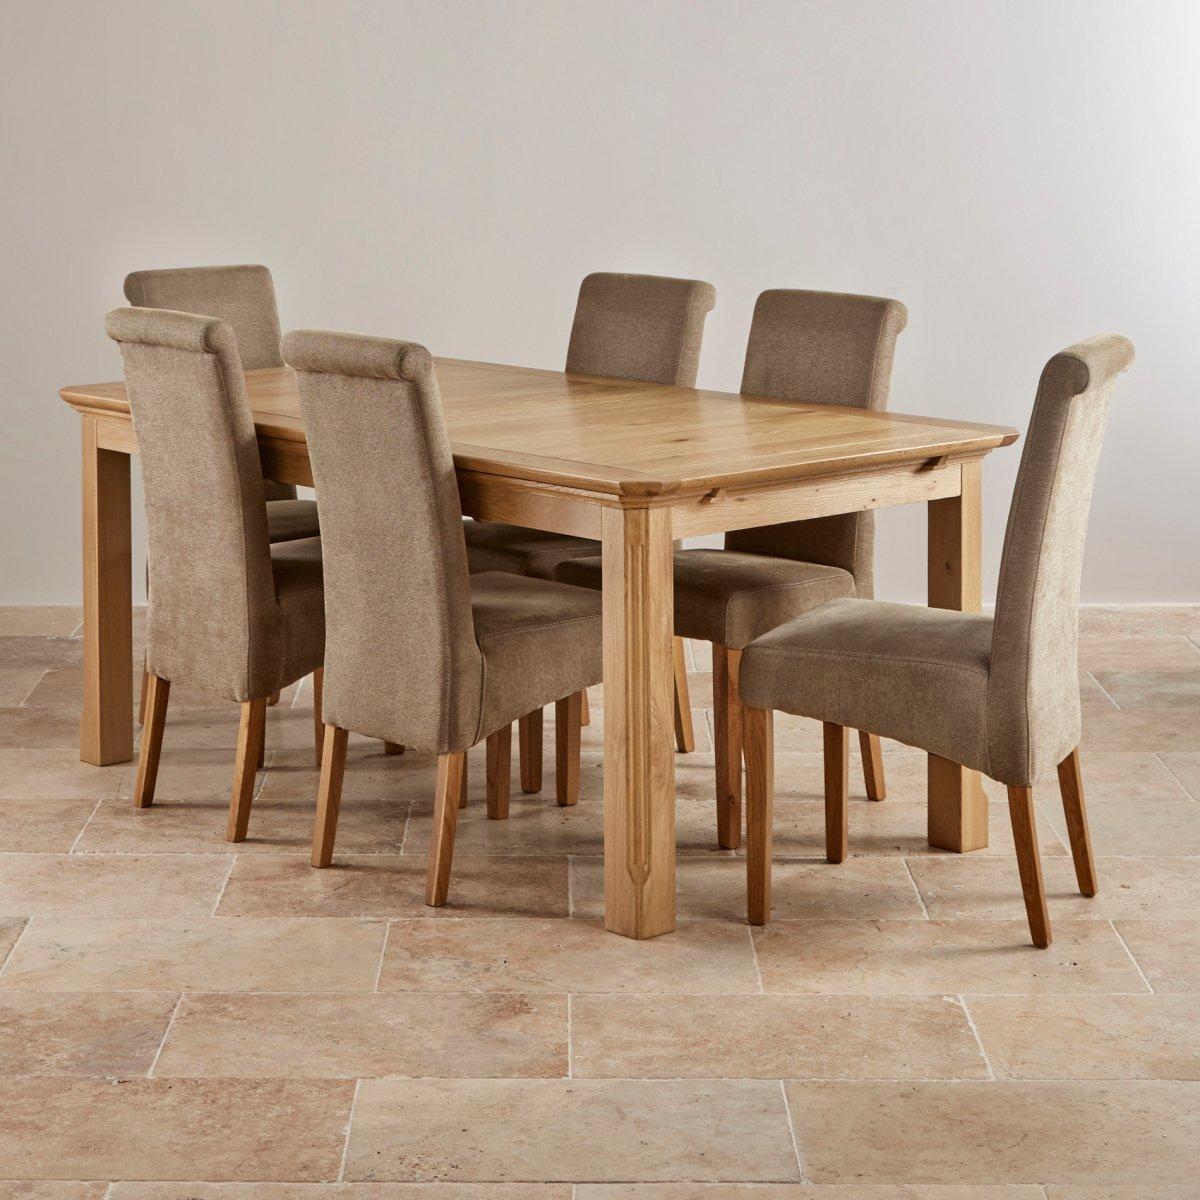 Edinburgh ft extending oak dining table plain sage chairs